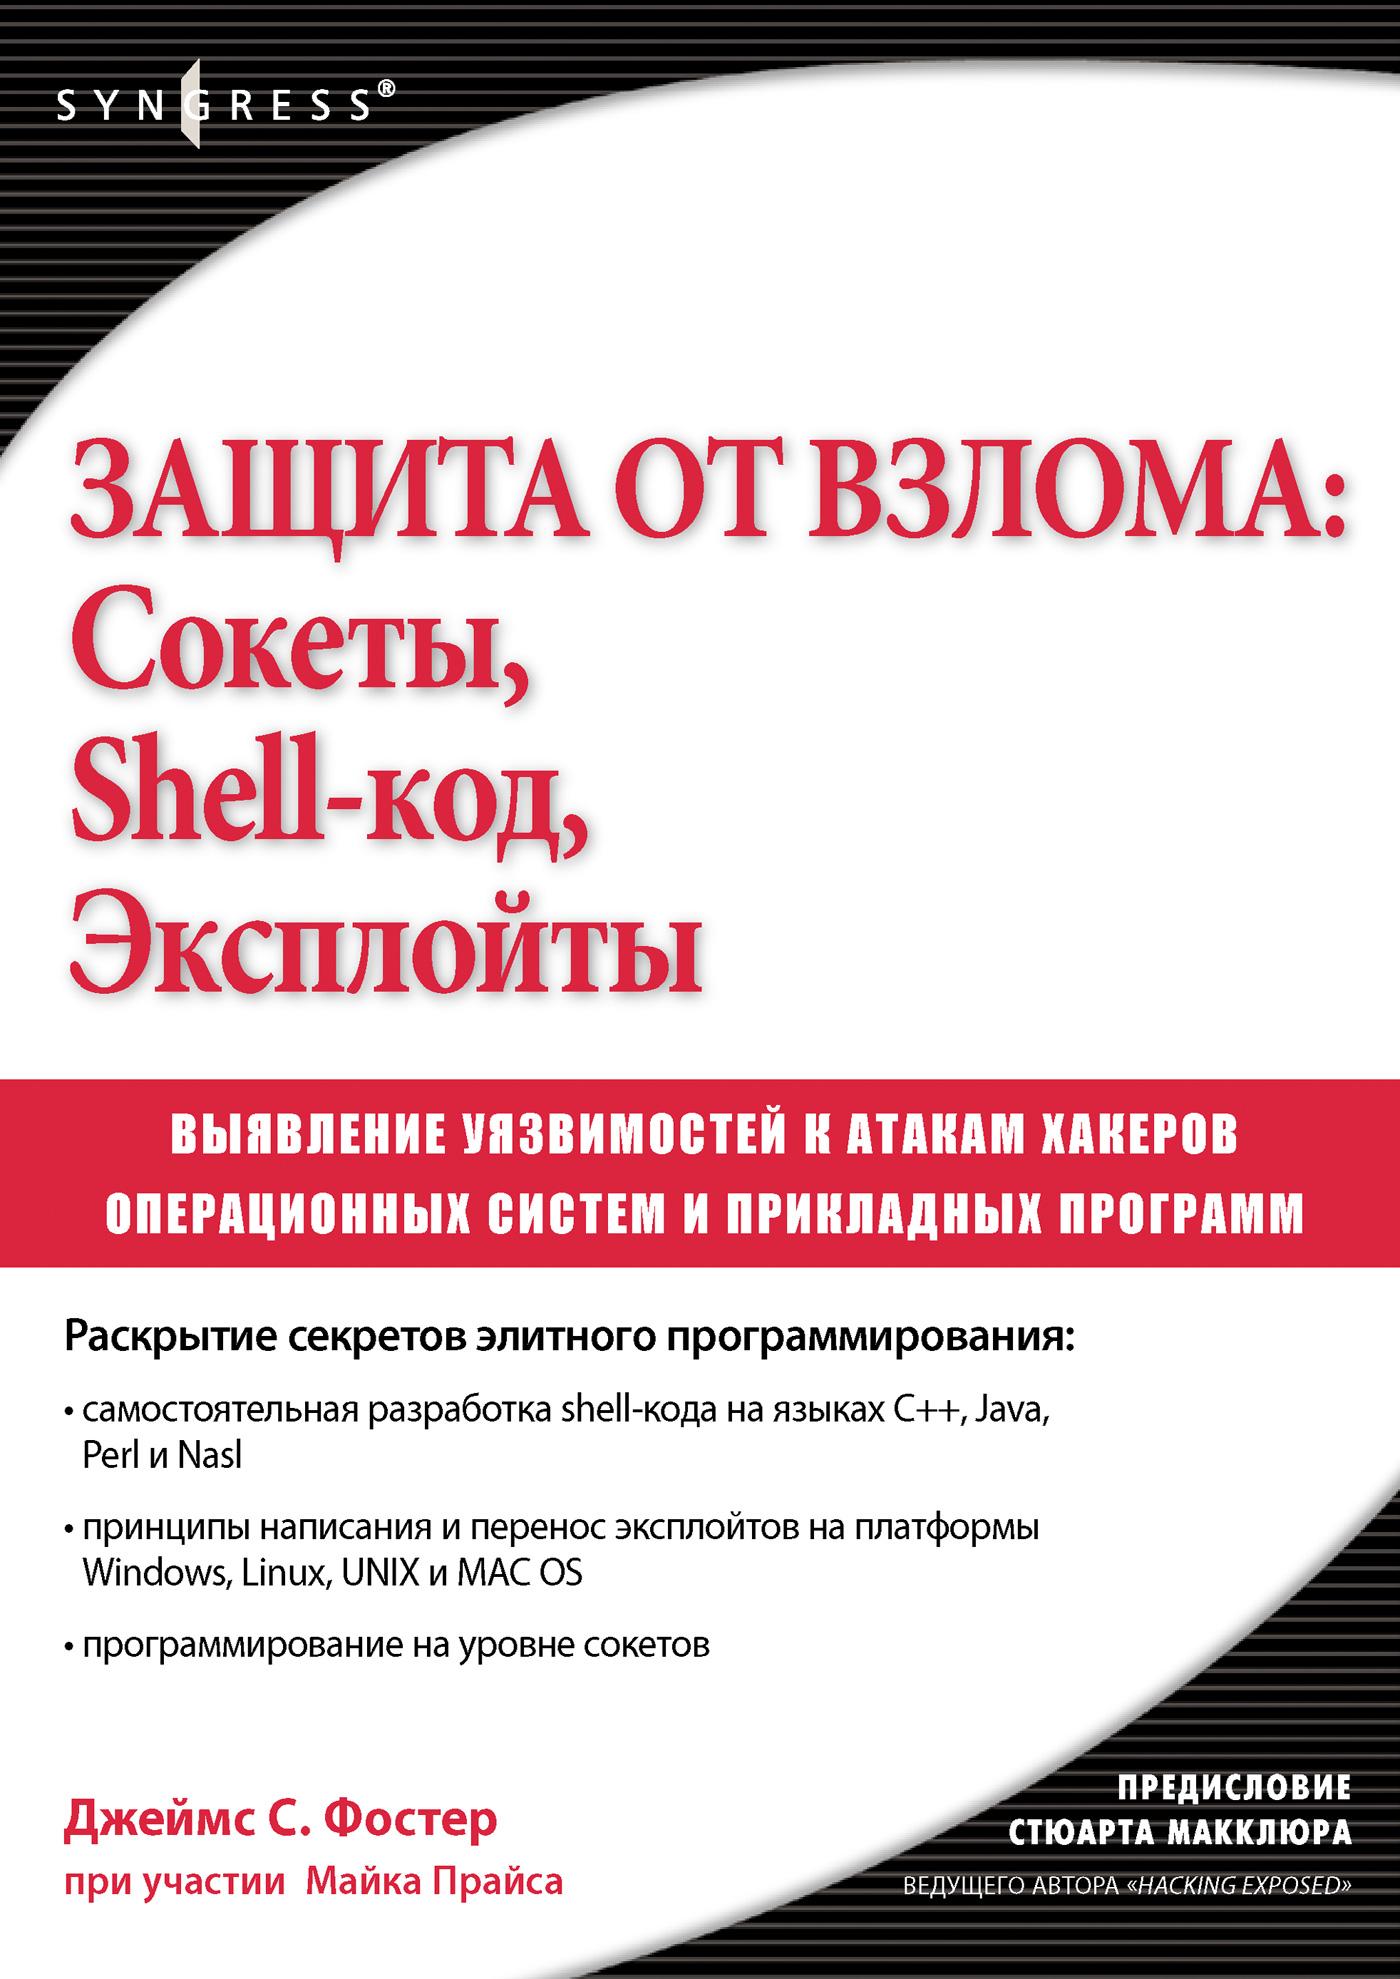 Джеймс Фостер «Защита от взлома: сокеты, shell-код, эксплойты»